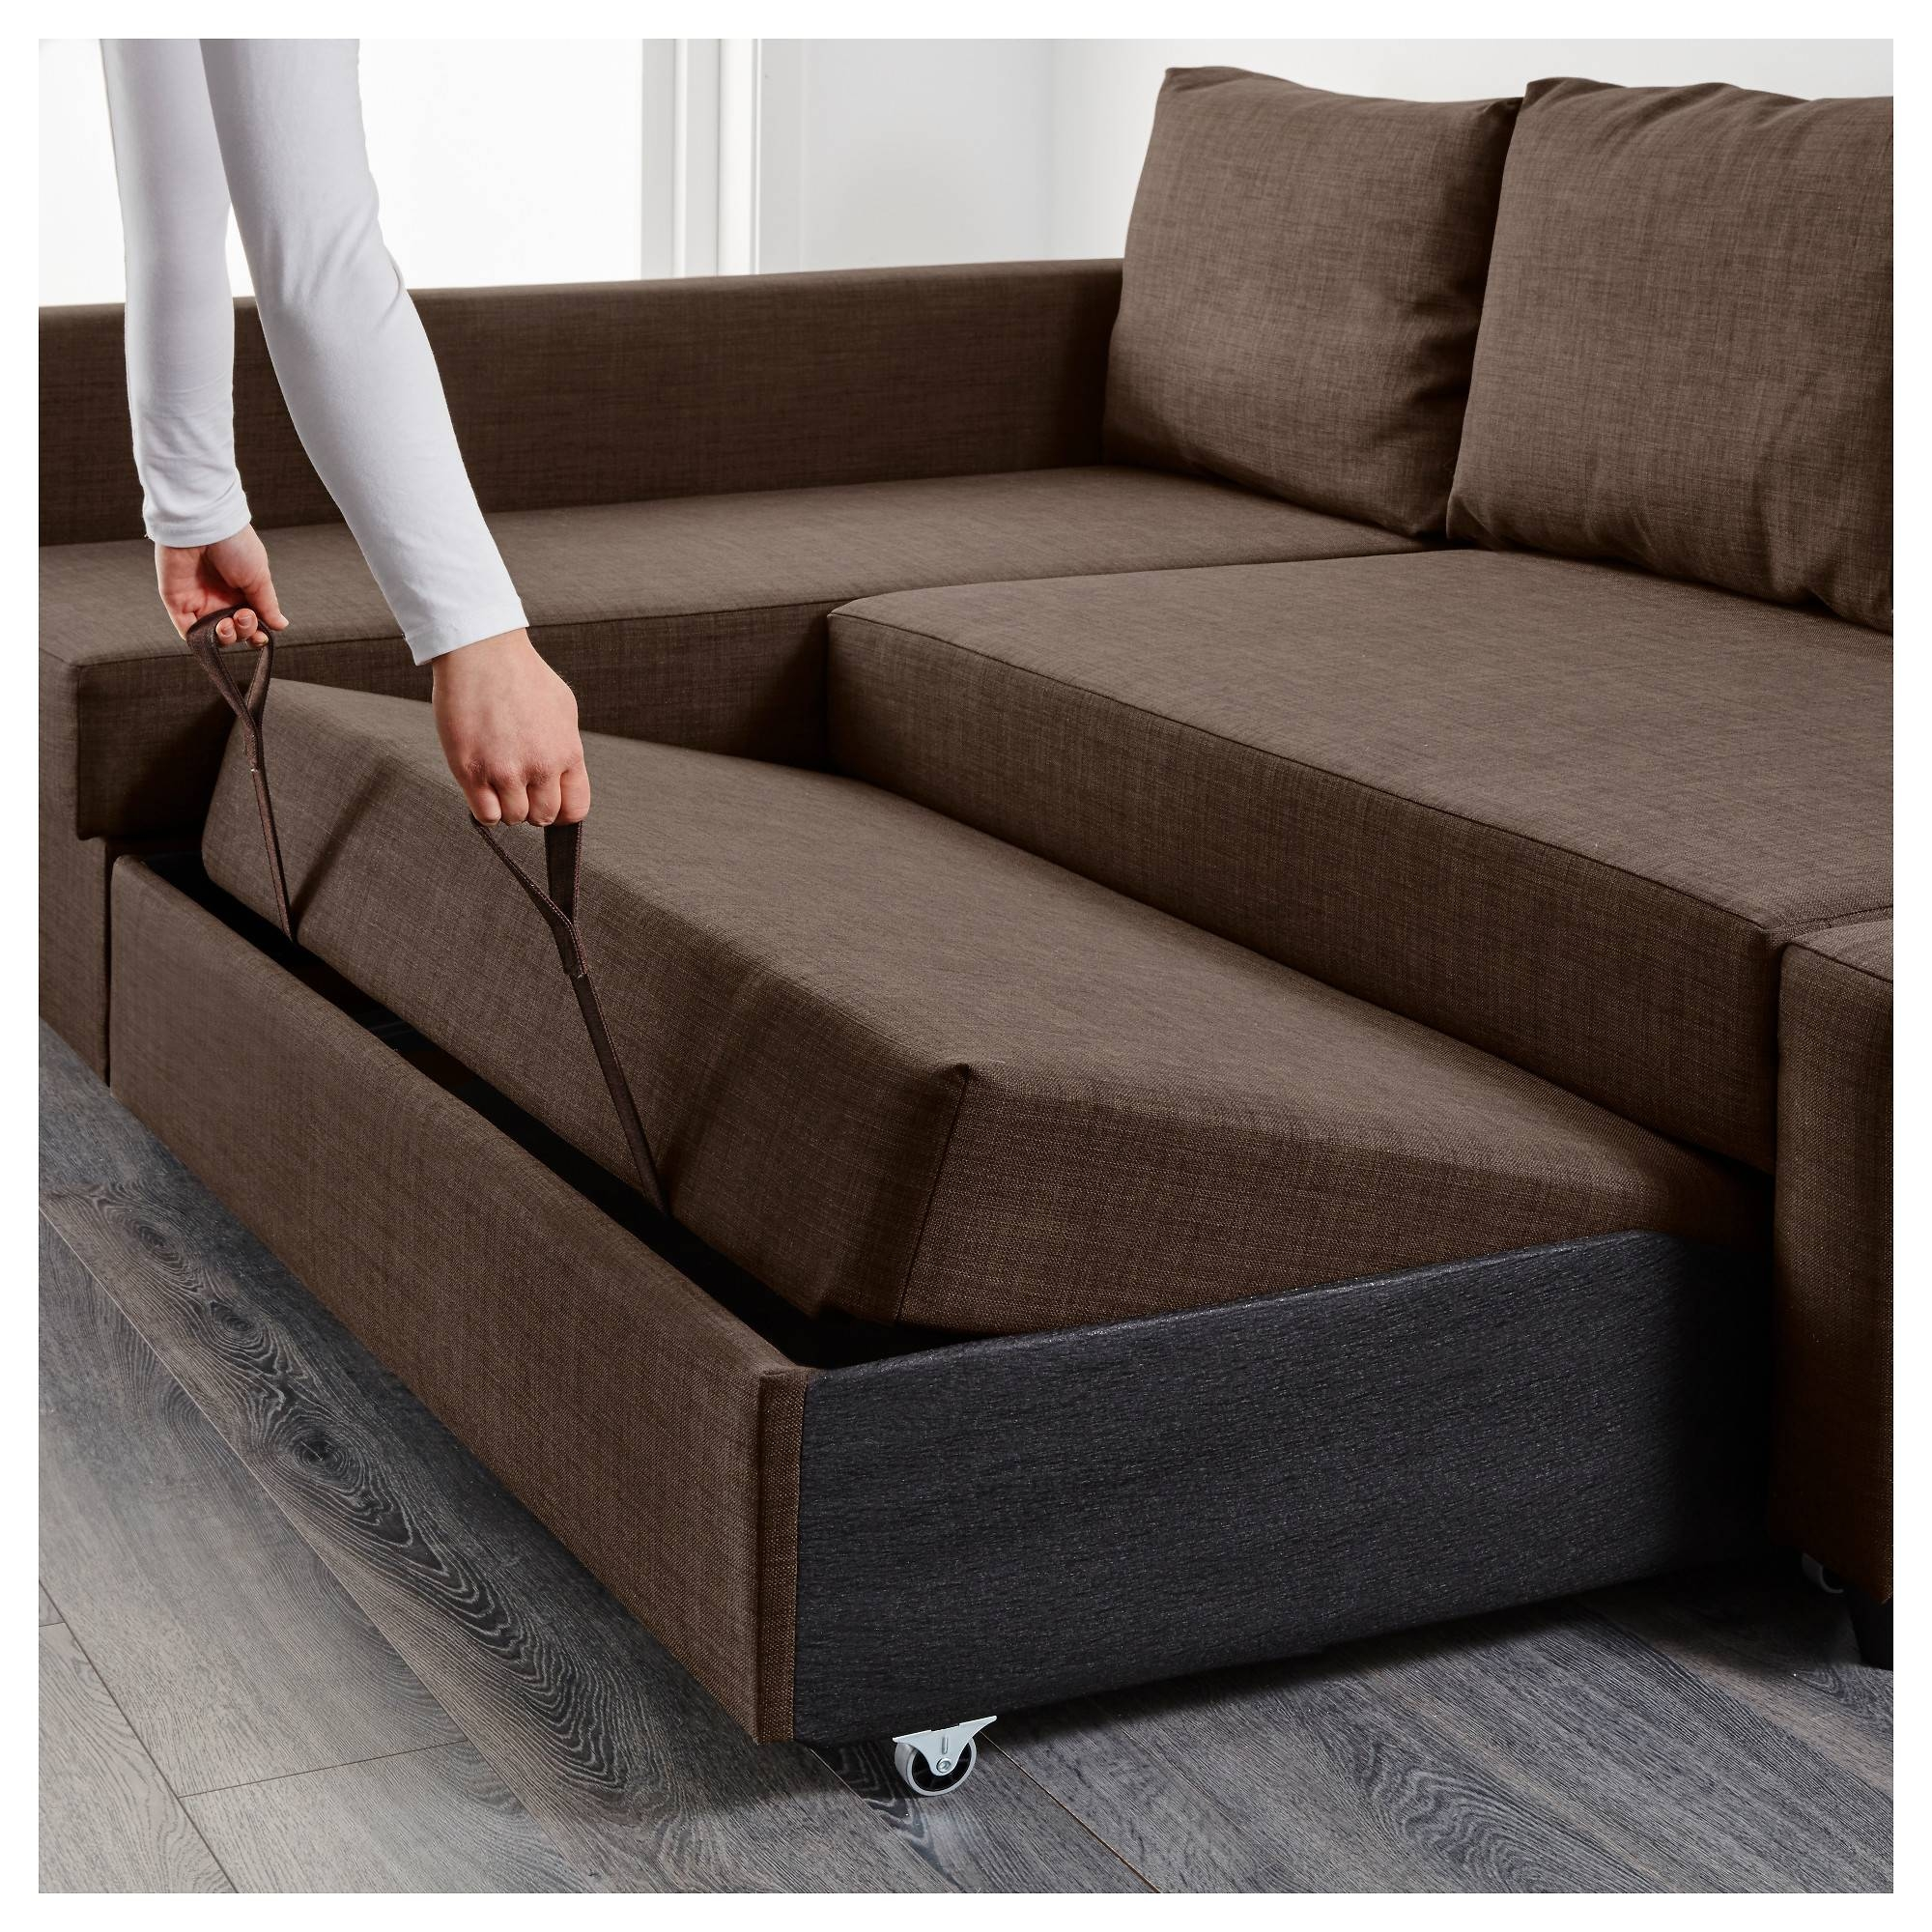 Friheten Corner Sofa-Bed With Storage - Skiftebo Dark Gray - Ikea in Corner Sofa Bed With Storage Ikea (Image 6 of 30)